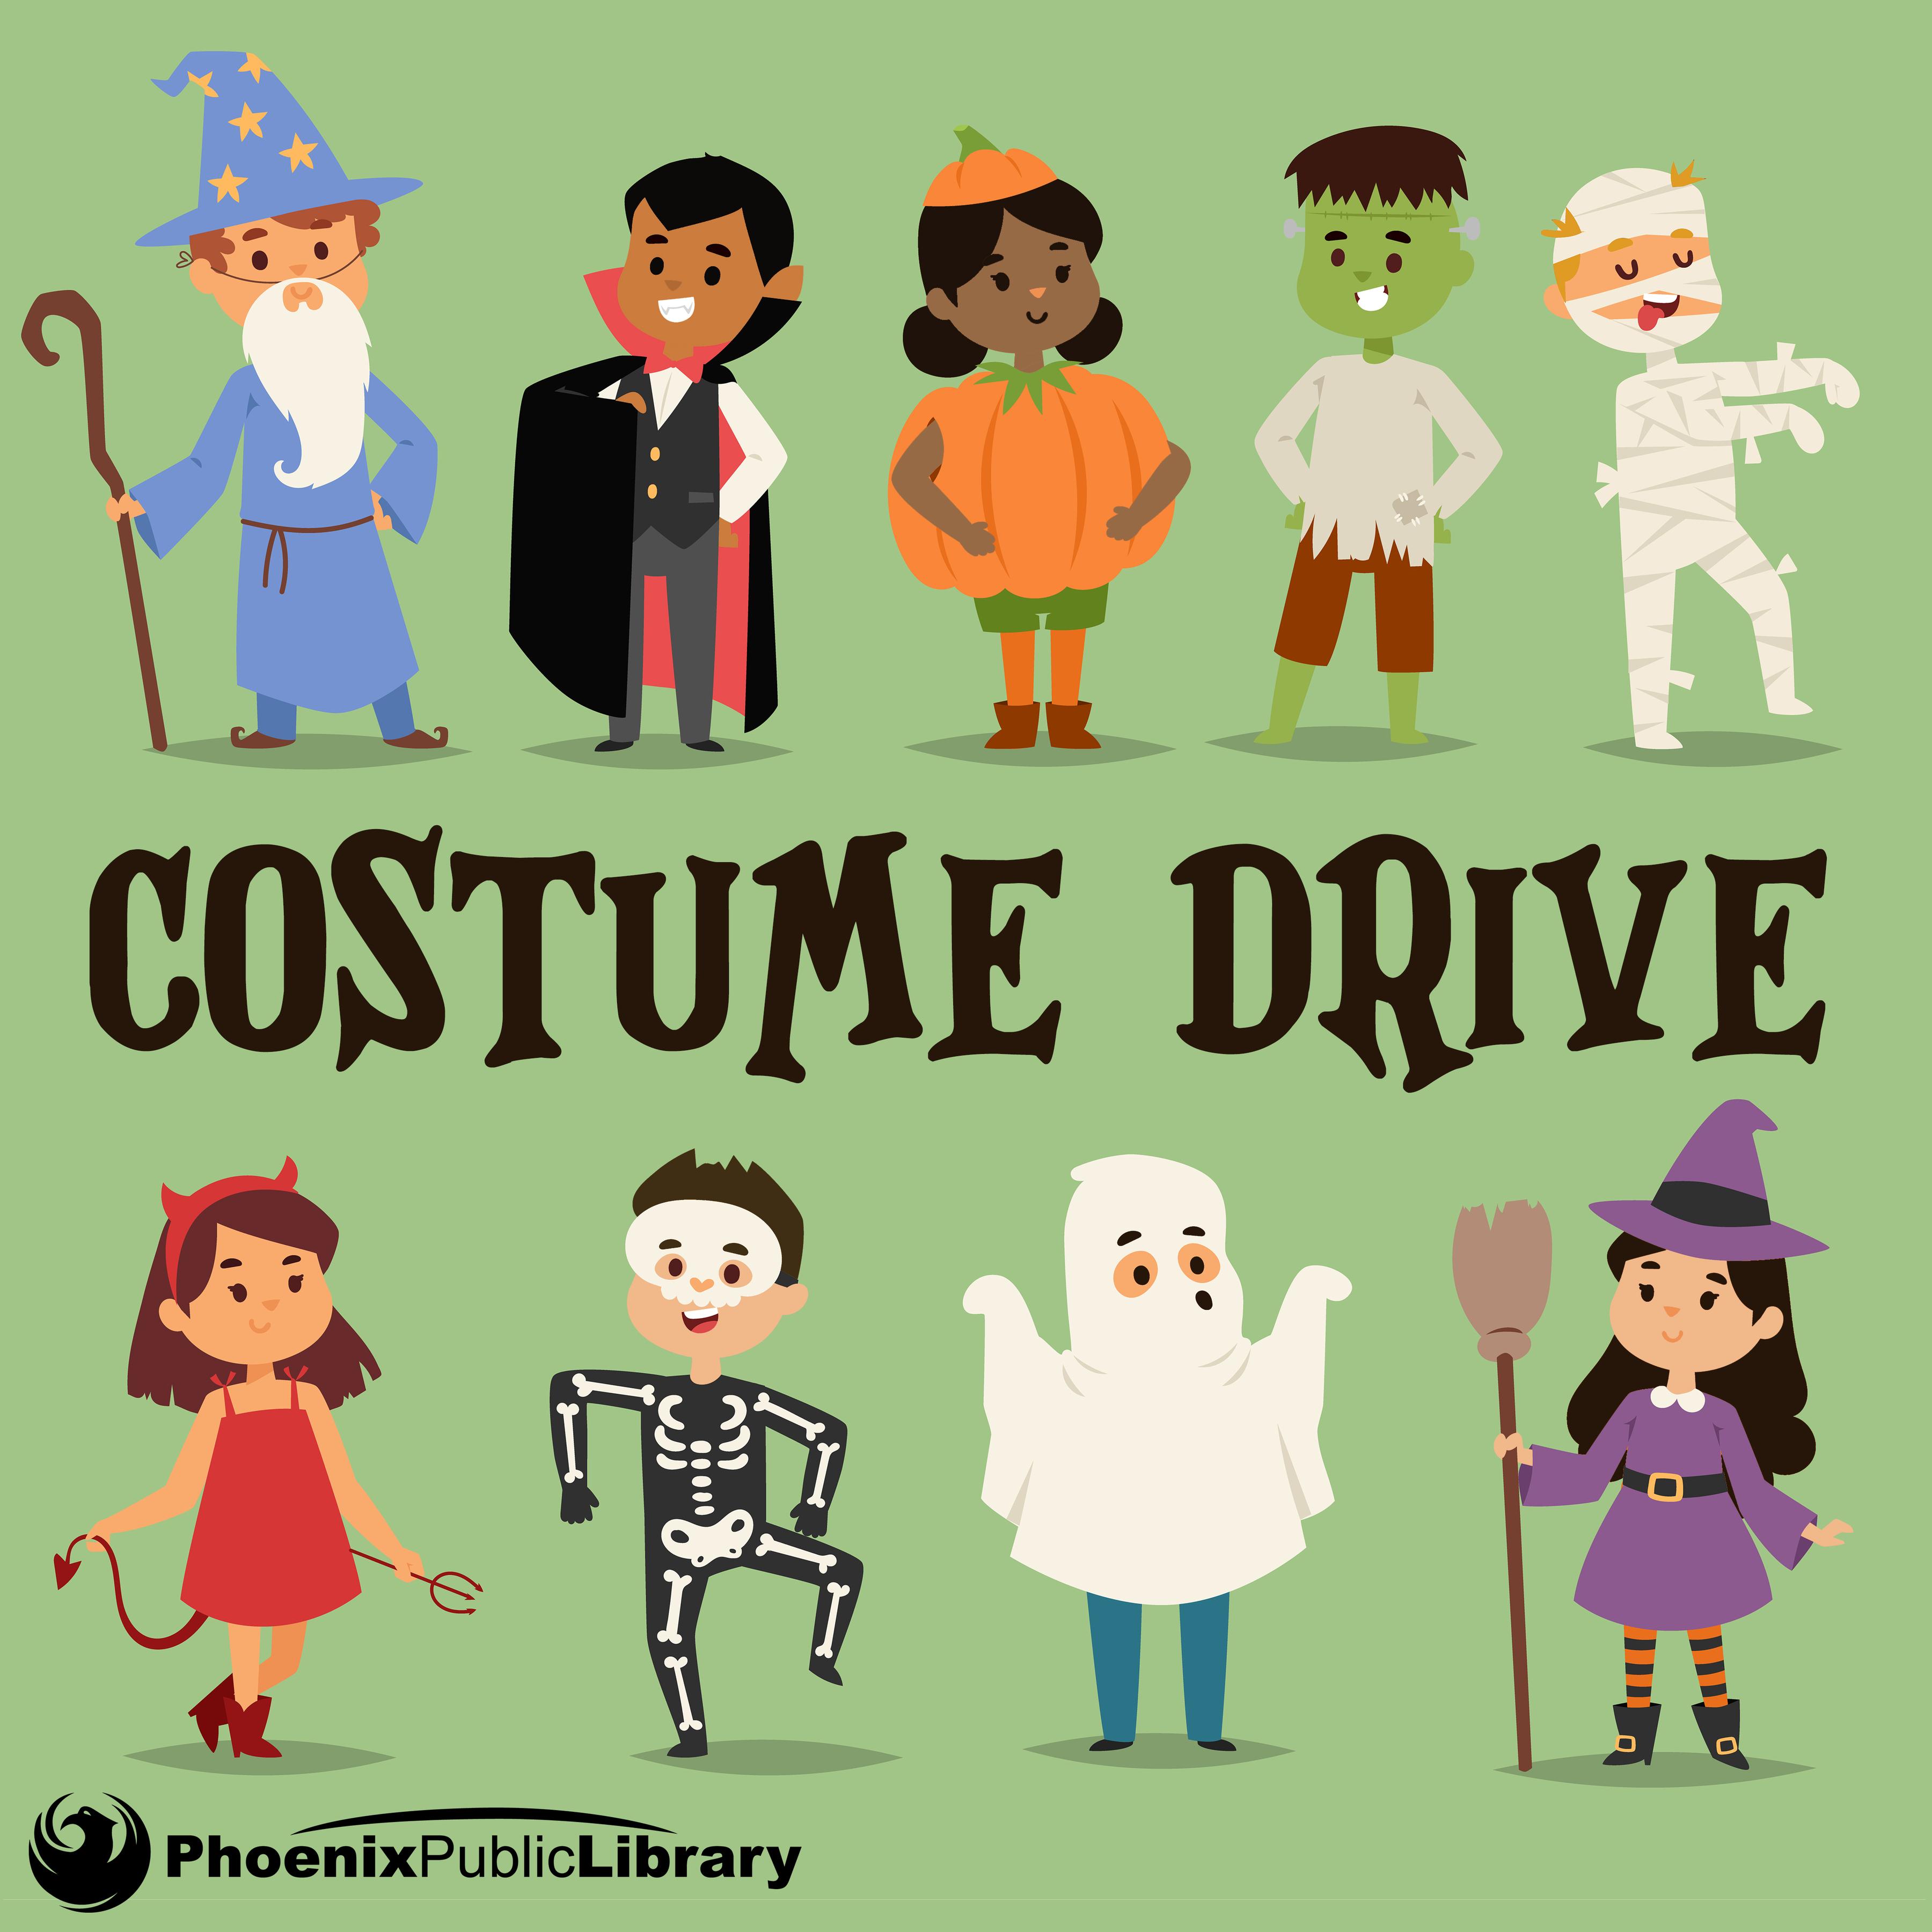 CostumeDrive_social.jpg